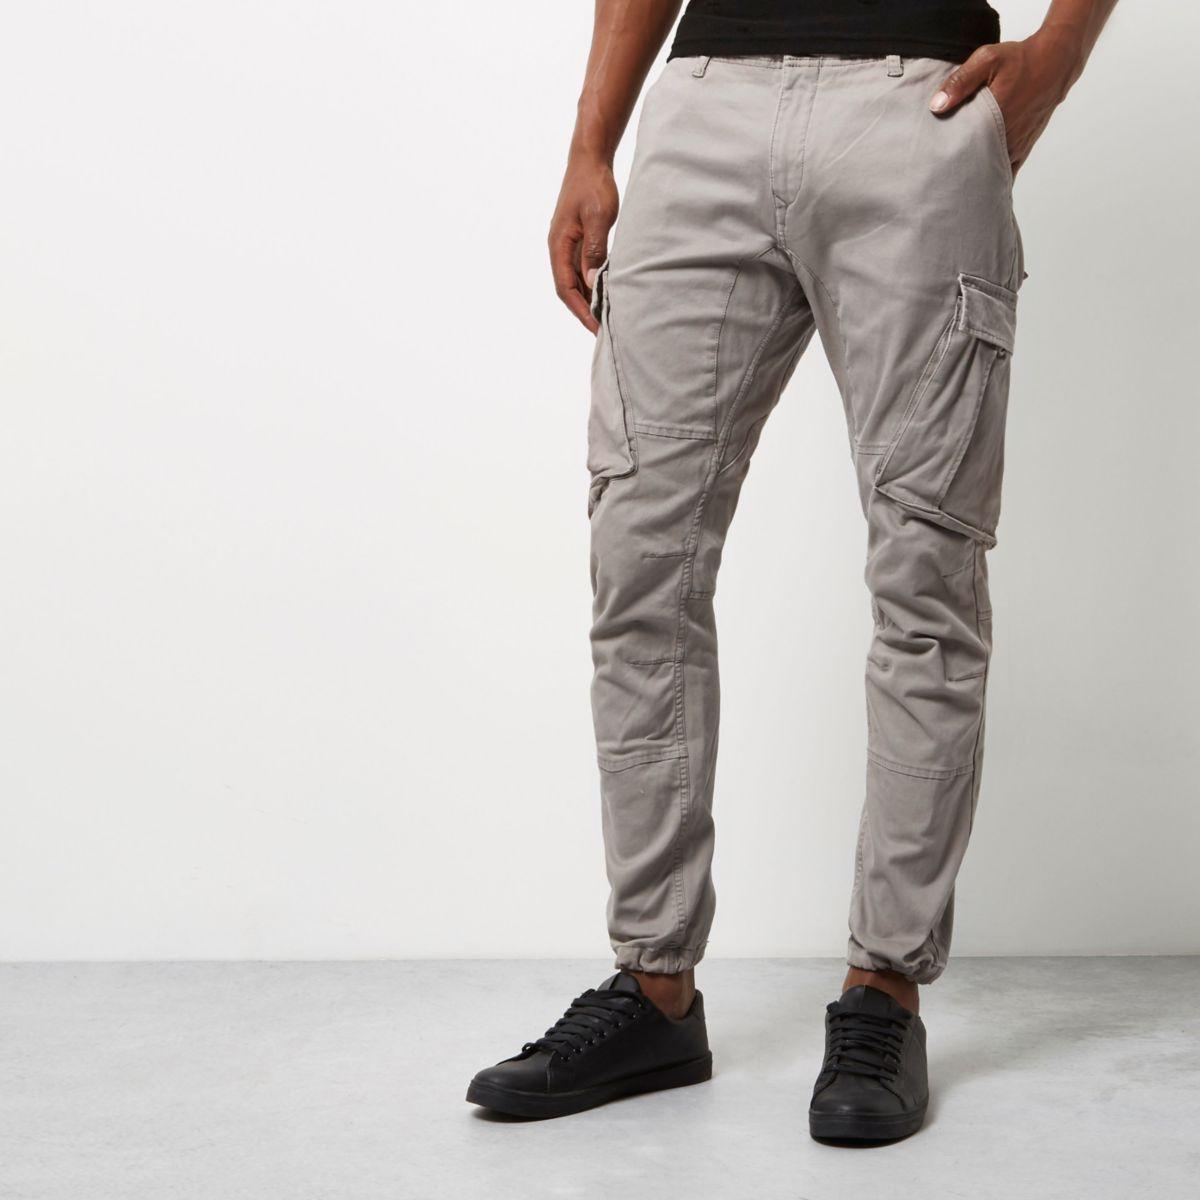 Grey slim fit cargo pants